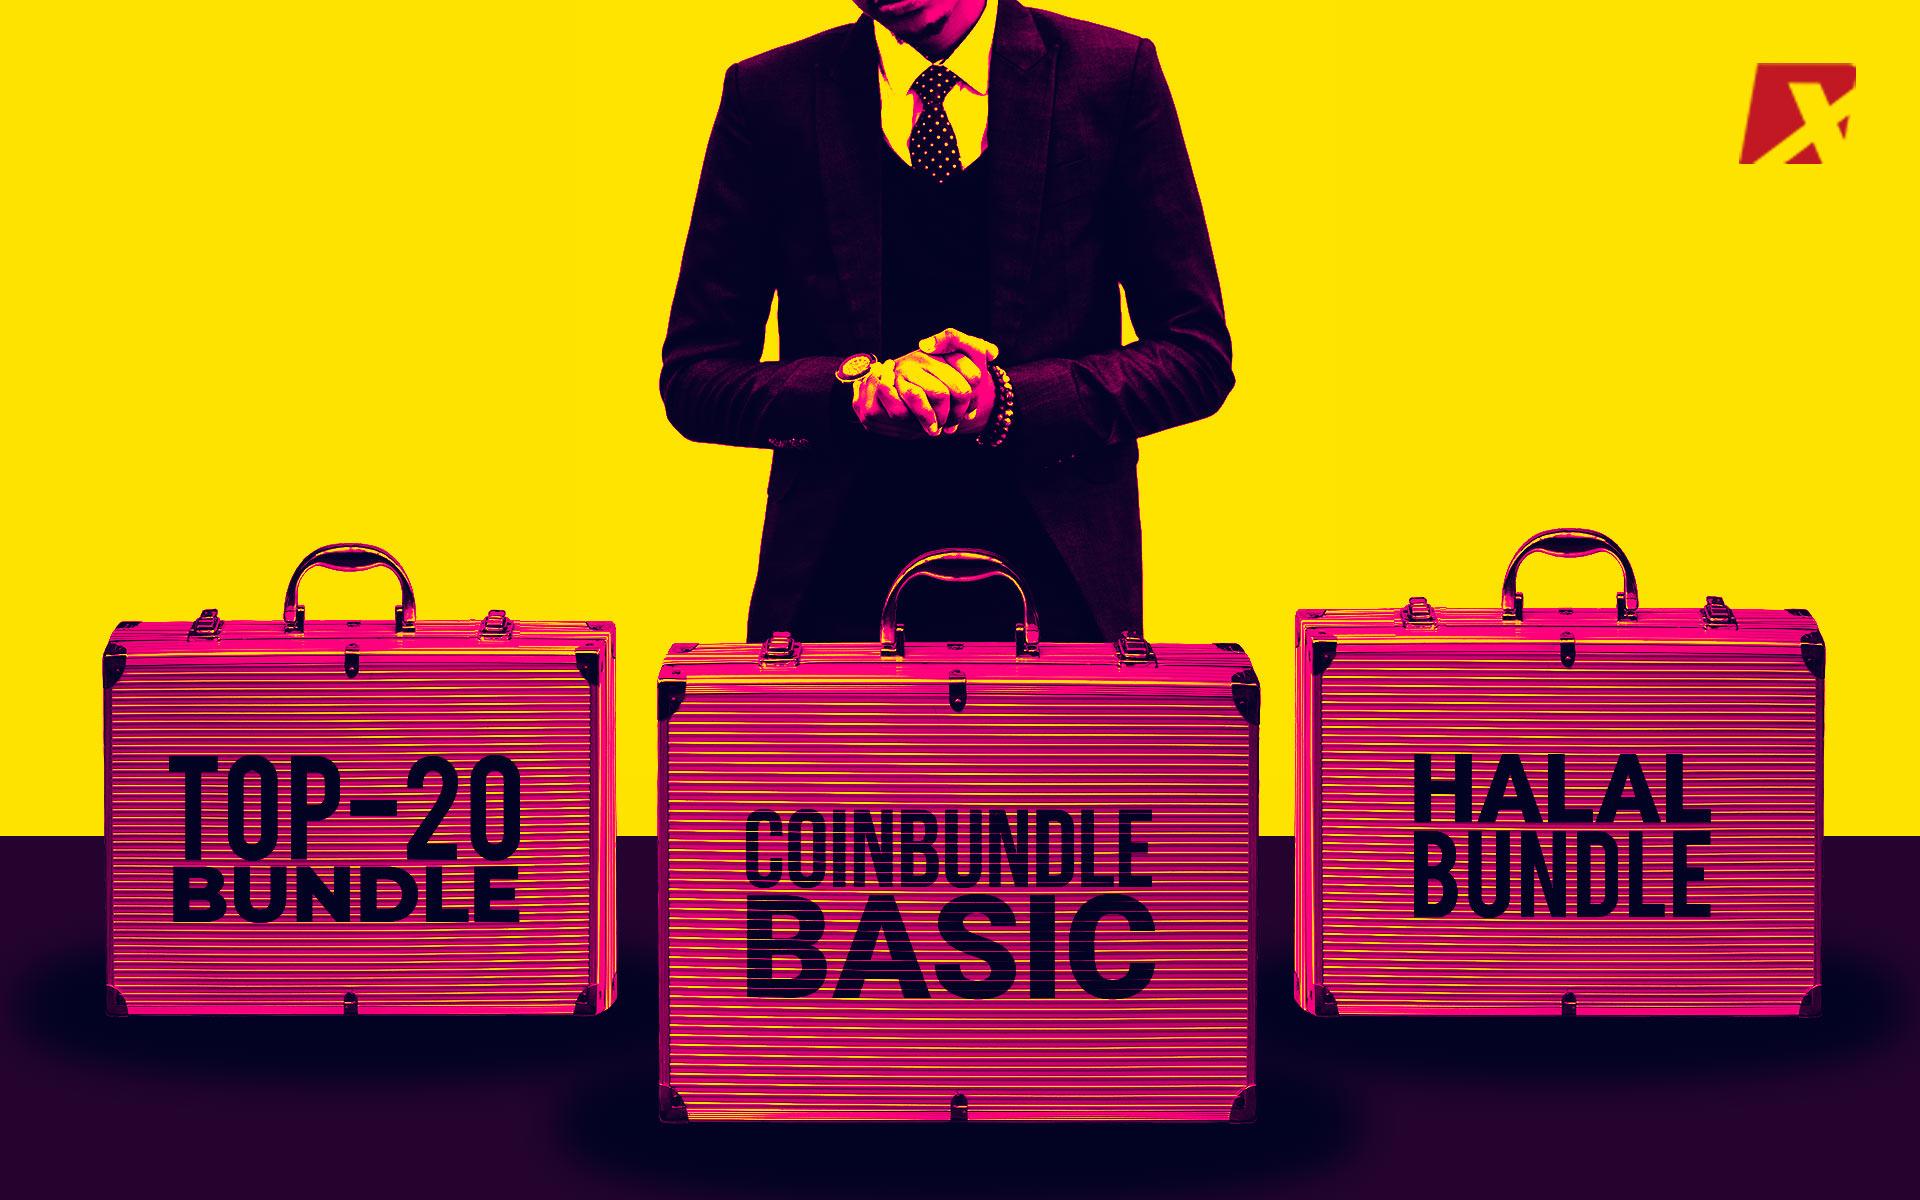 Crypto Investing Platform CoinBundle Adds 3 New Bundles For Investors